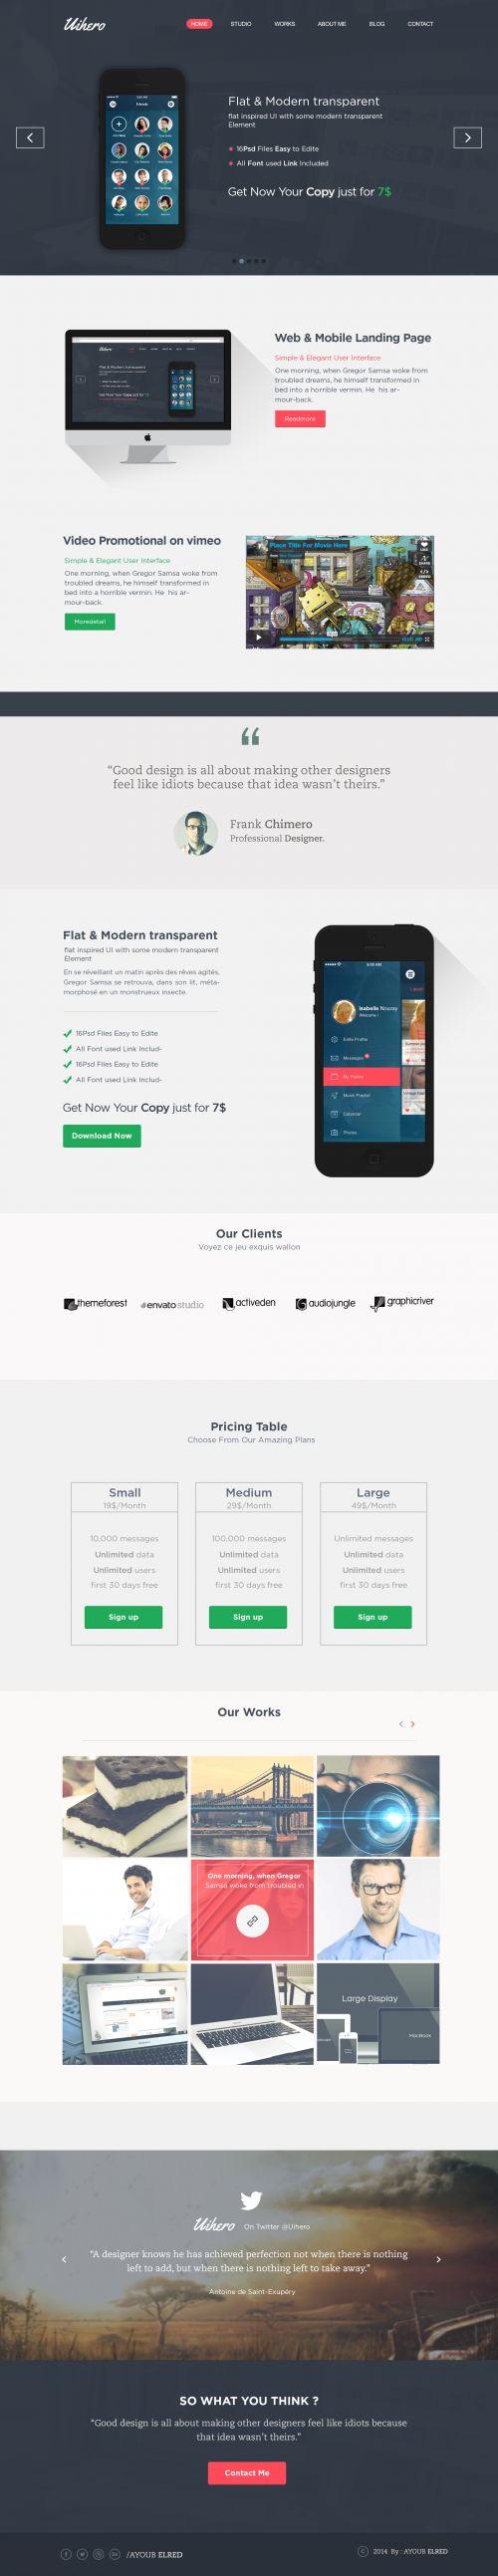 Breakupus Wonderful Free Resume Builder Websites And Applications